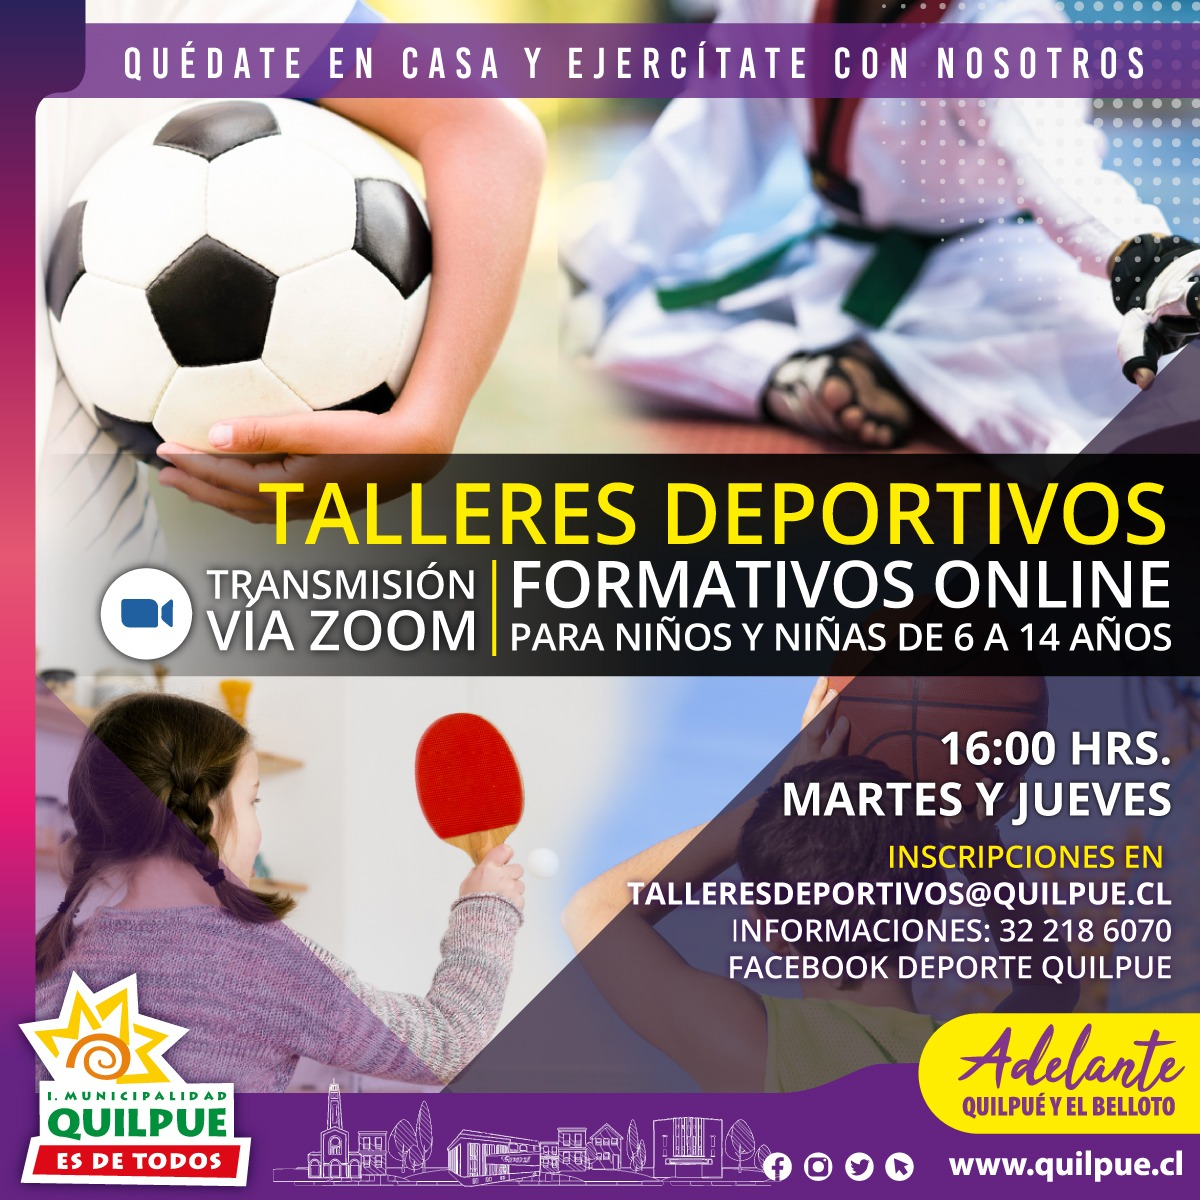 Talleres Deportivos Formativos Online